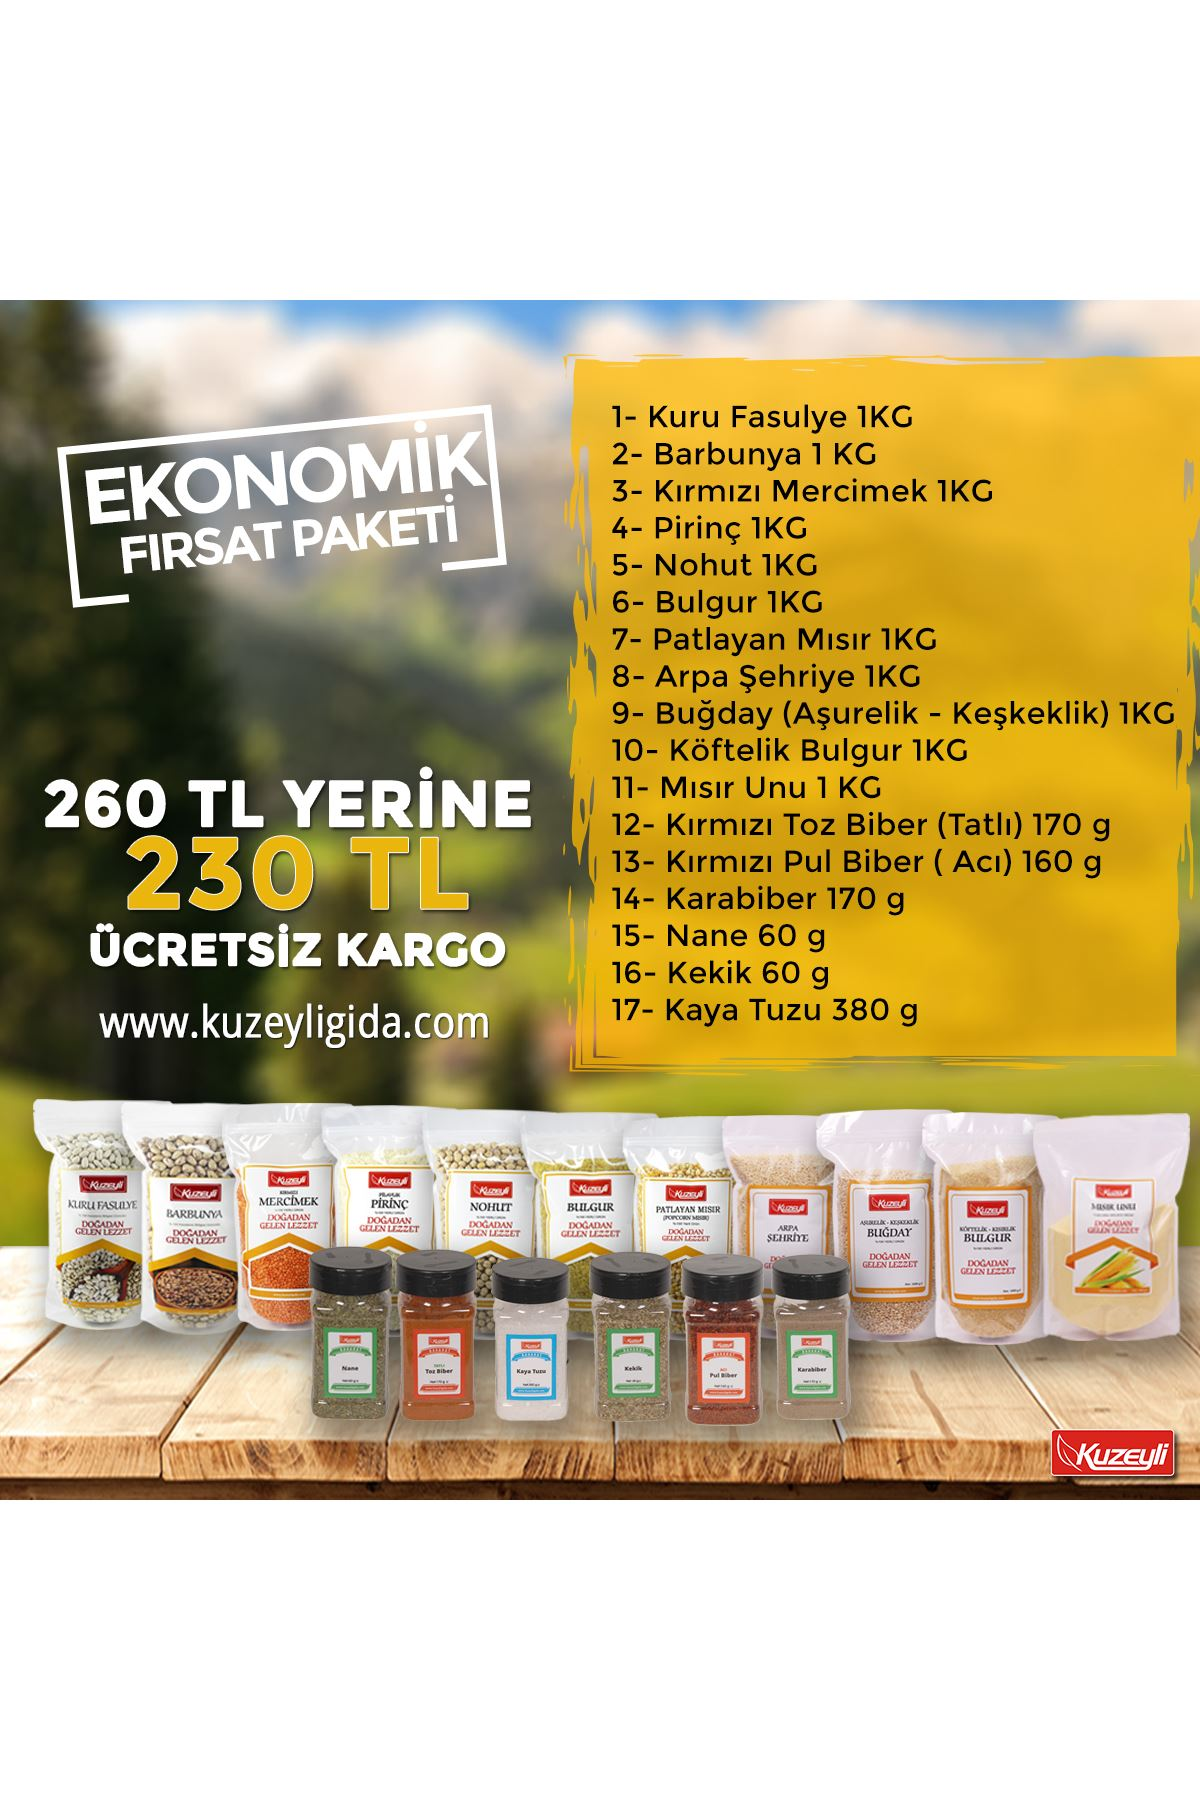 EKONOMİK FIRSAT PAKETİ